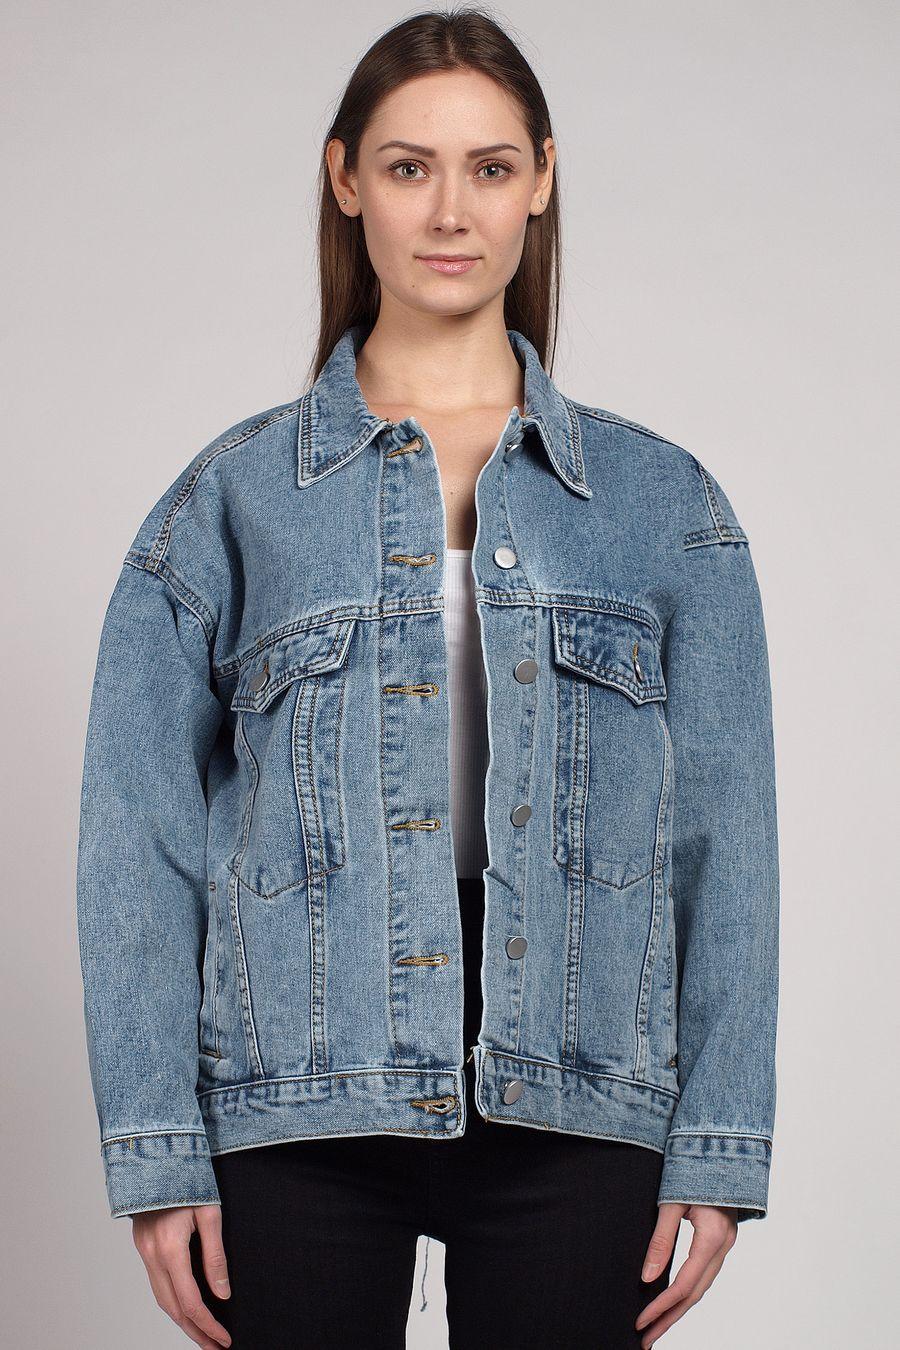 Жакет женский (джинсовка) LRZBS 2026 - фото 1